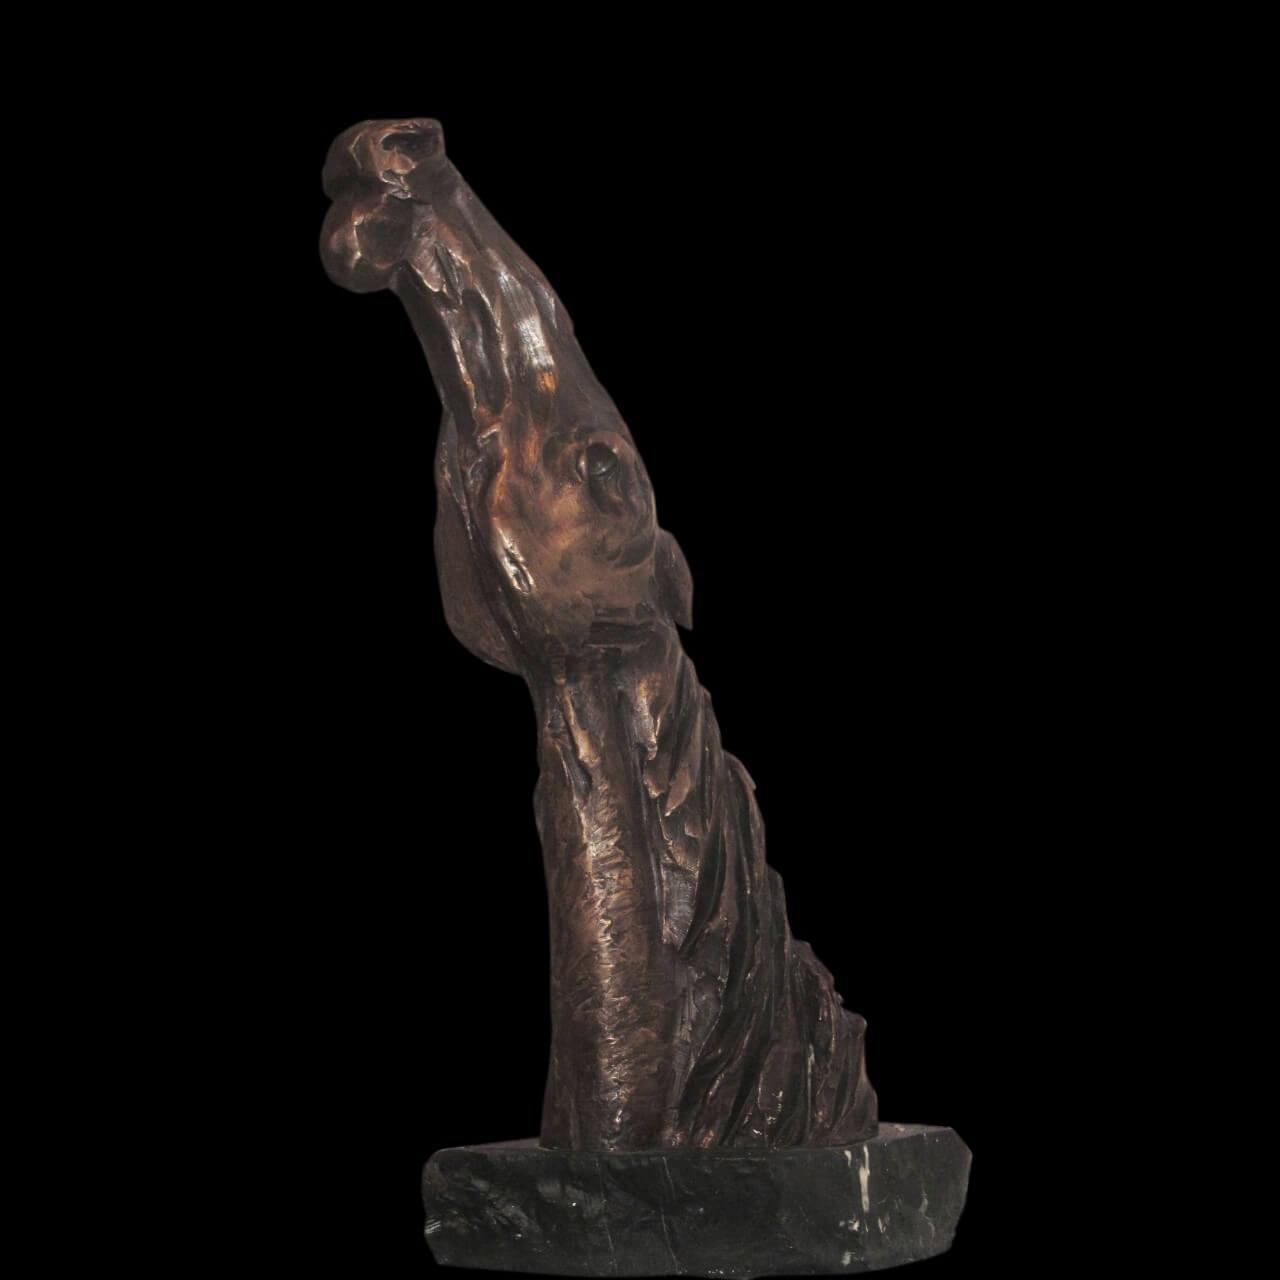 mario pavesi italian sculptur painter bronze horse head big